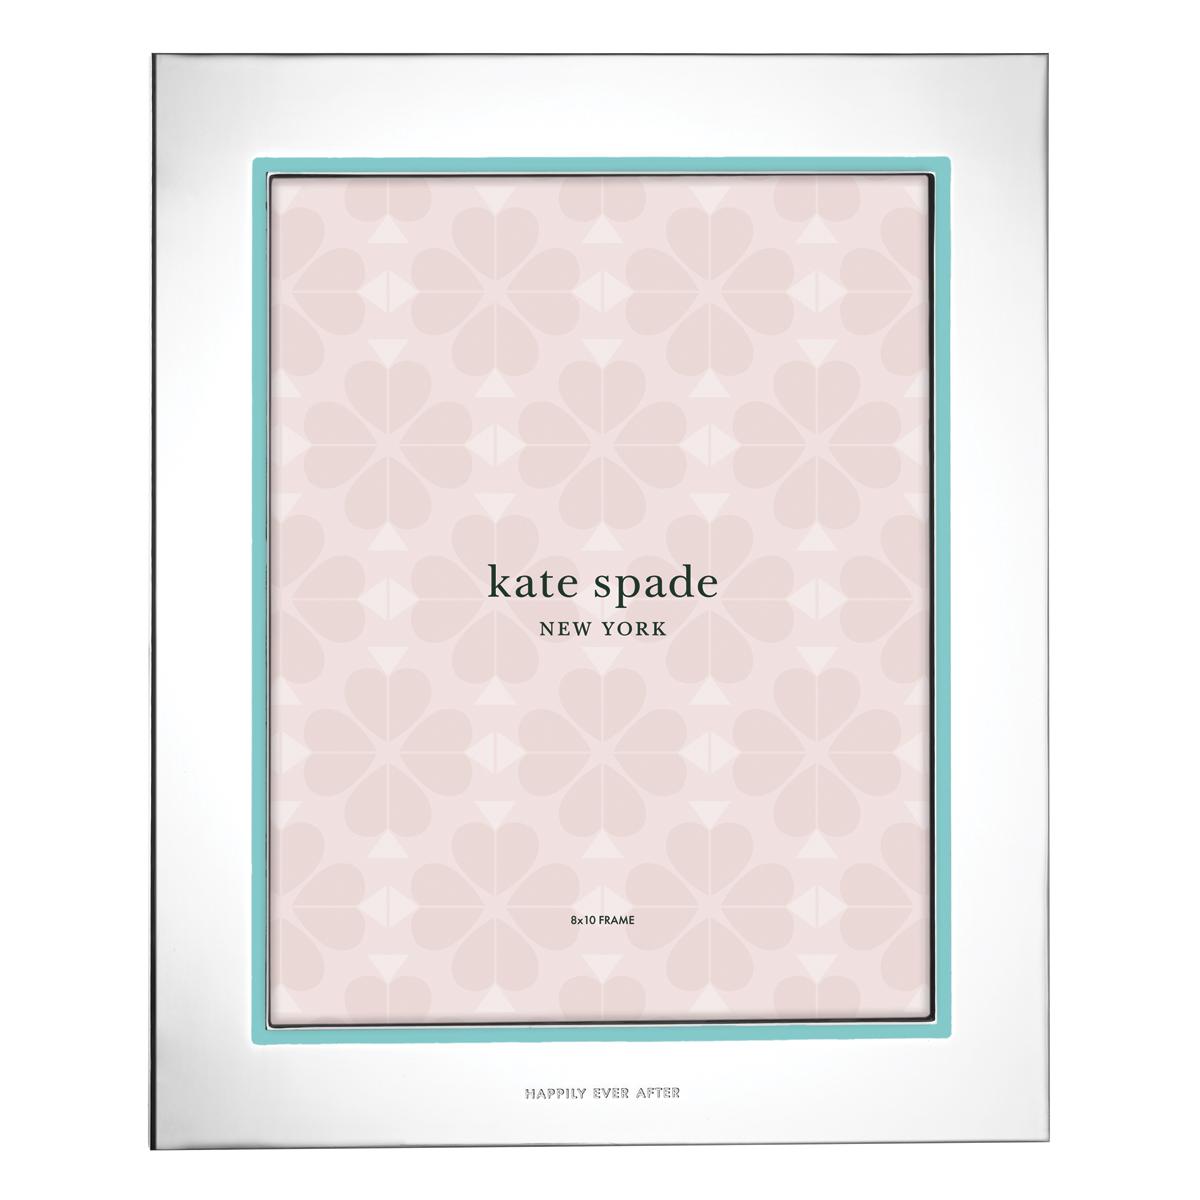 "Kate Spade New York, Lenox Take The Cake 8x10"" Picture Frame"